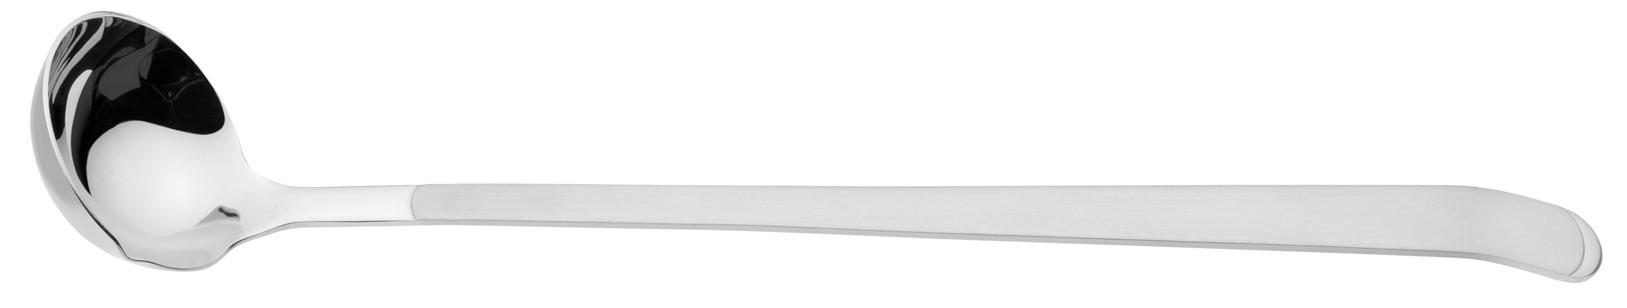 GASTRONOM Dressinglöffel 35,5cm, 30ml